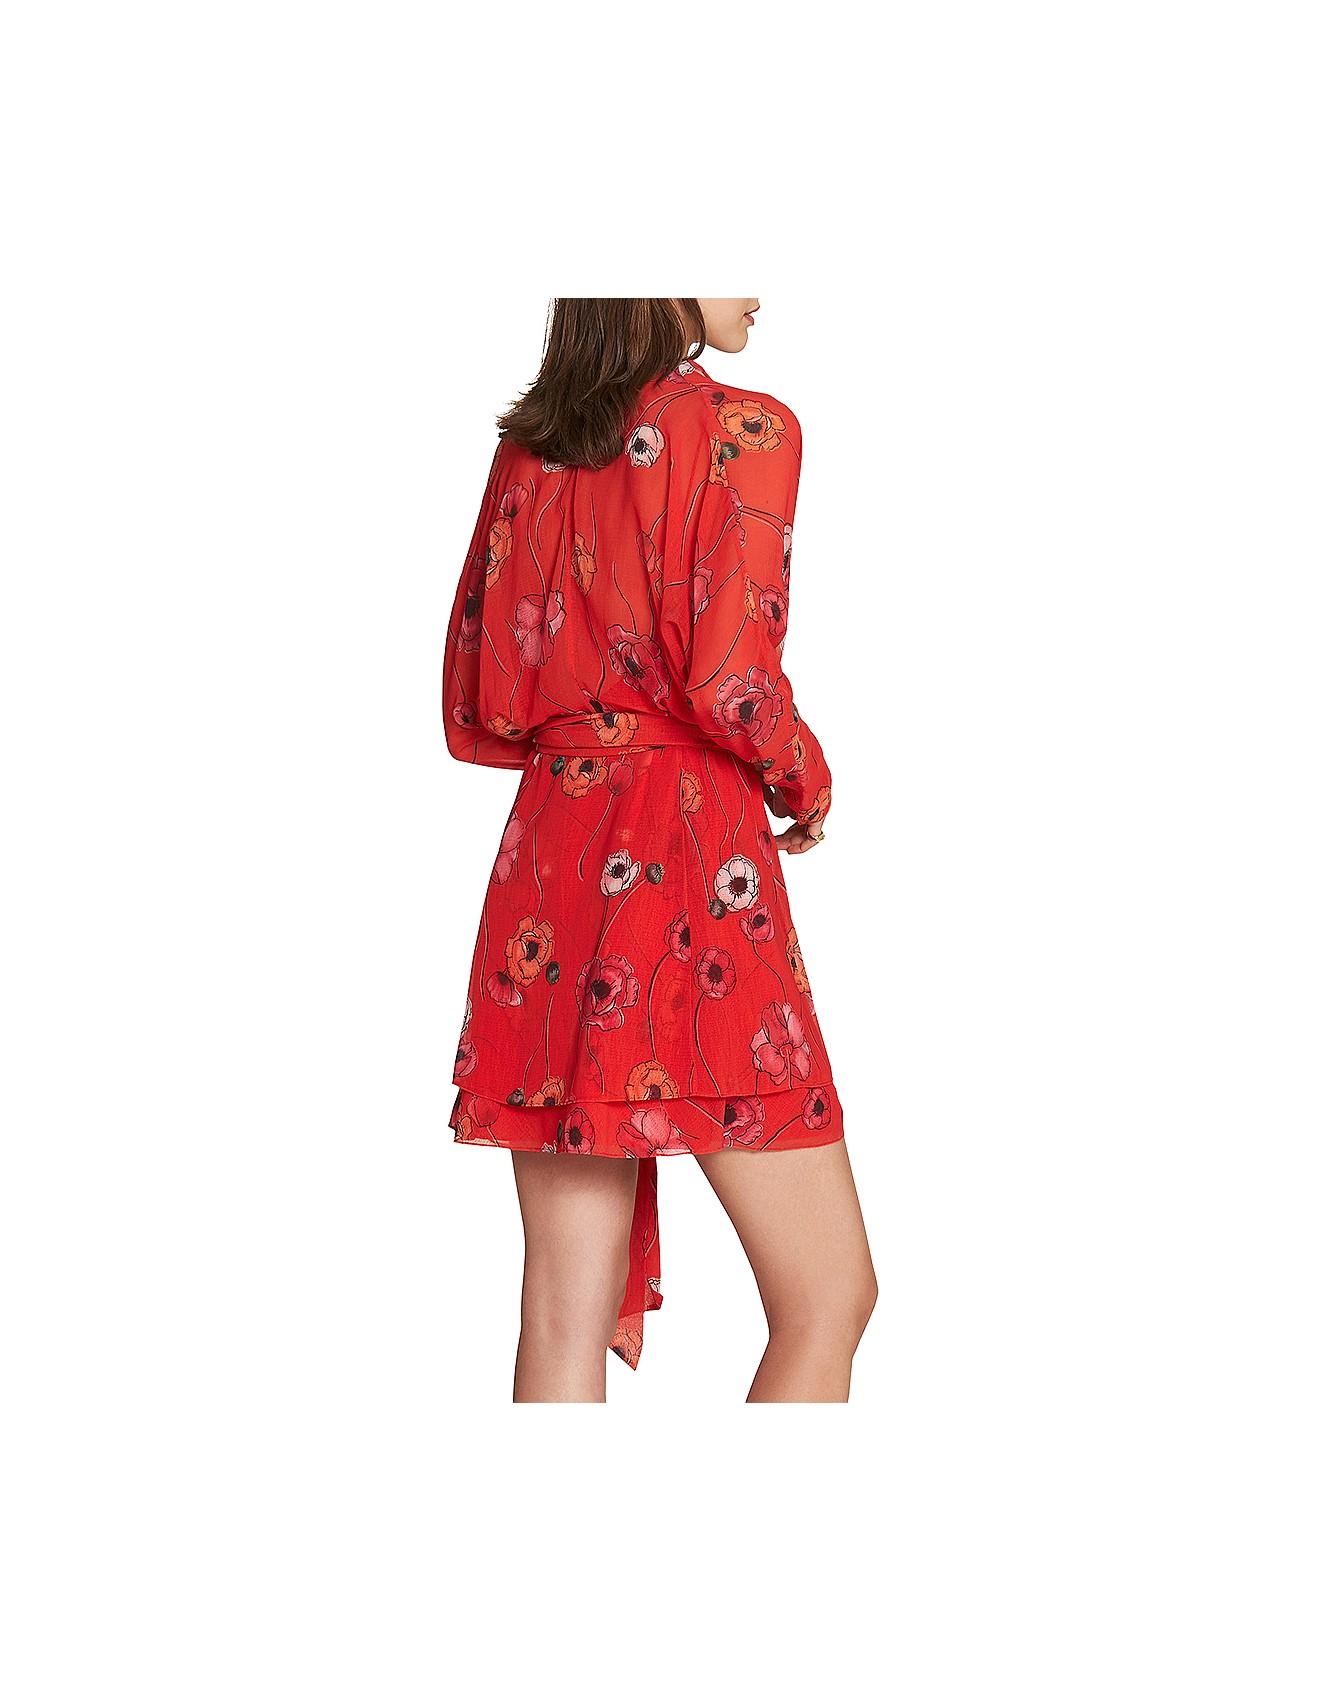 4a584a87c7 Mona Mini Dress. 1